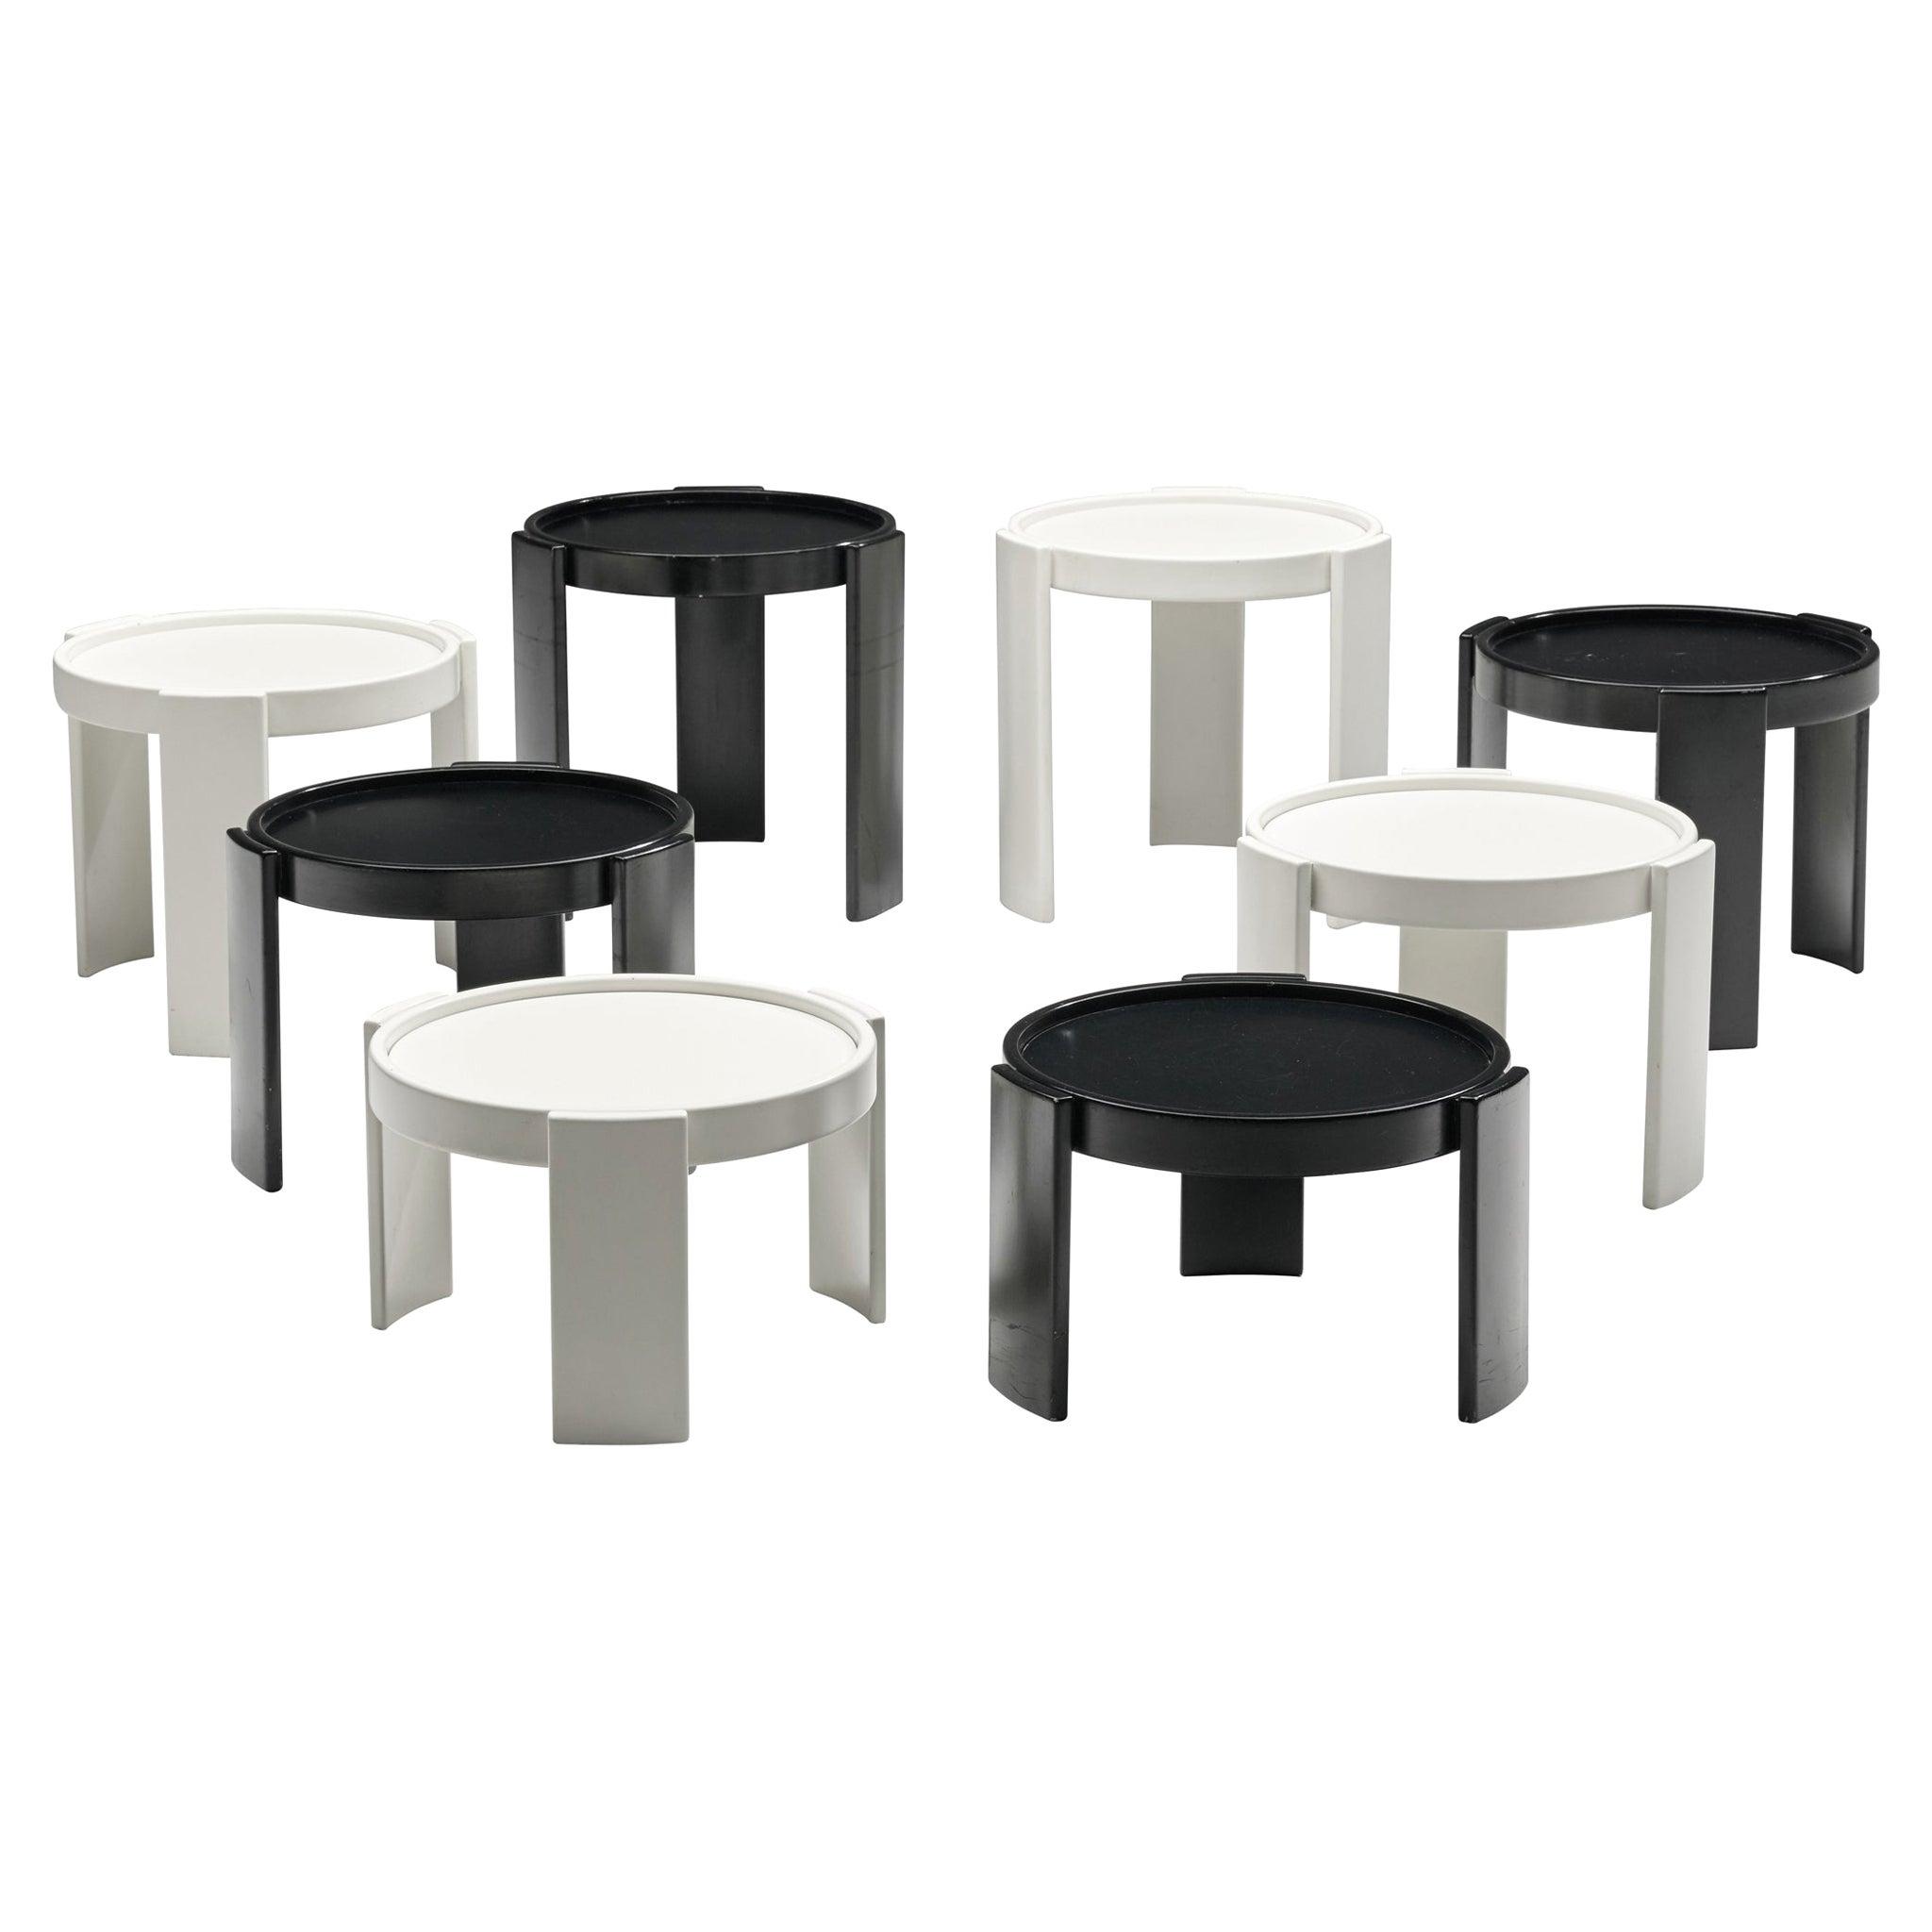 2 Sets of Gianfranco Frattini '780' Nesting Tables